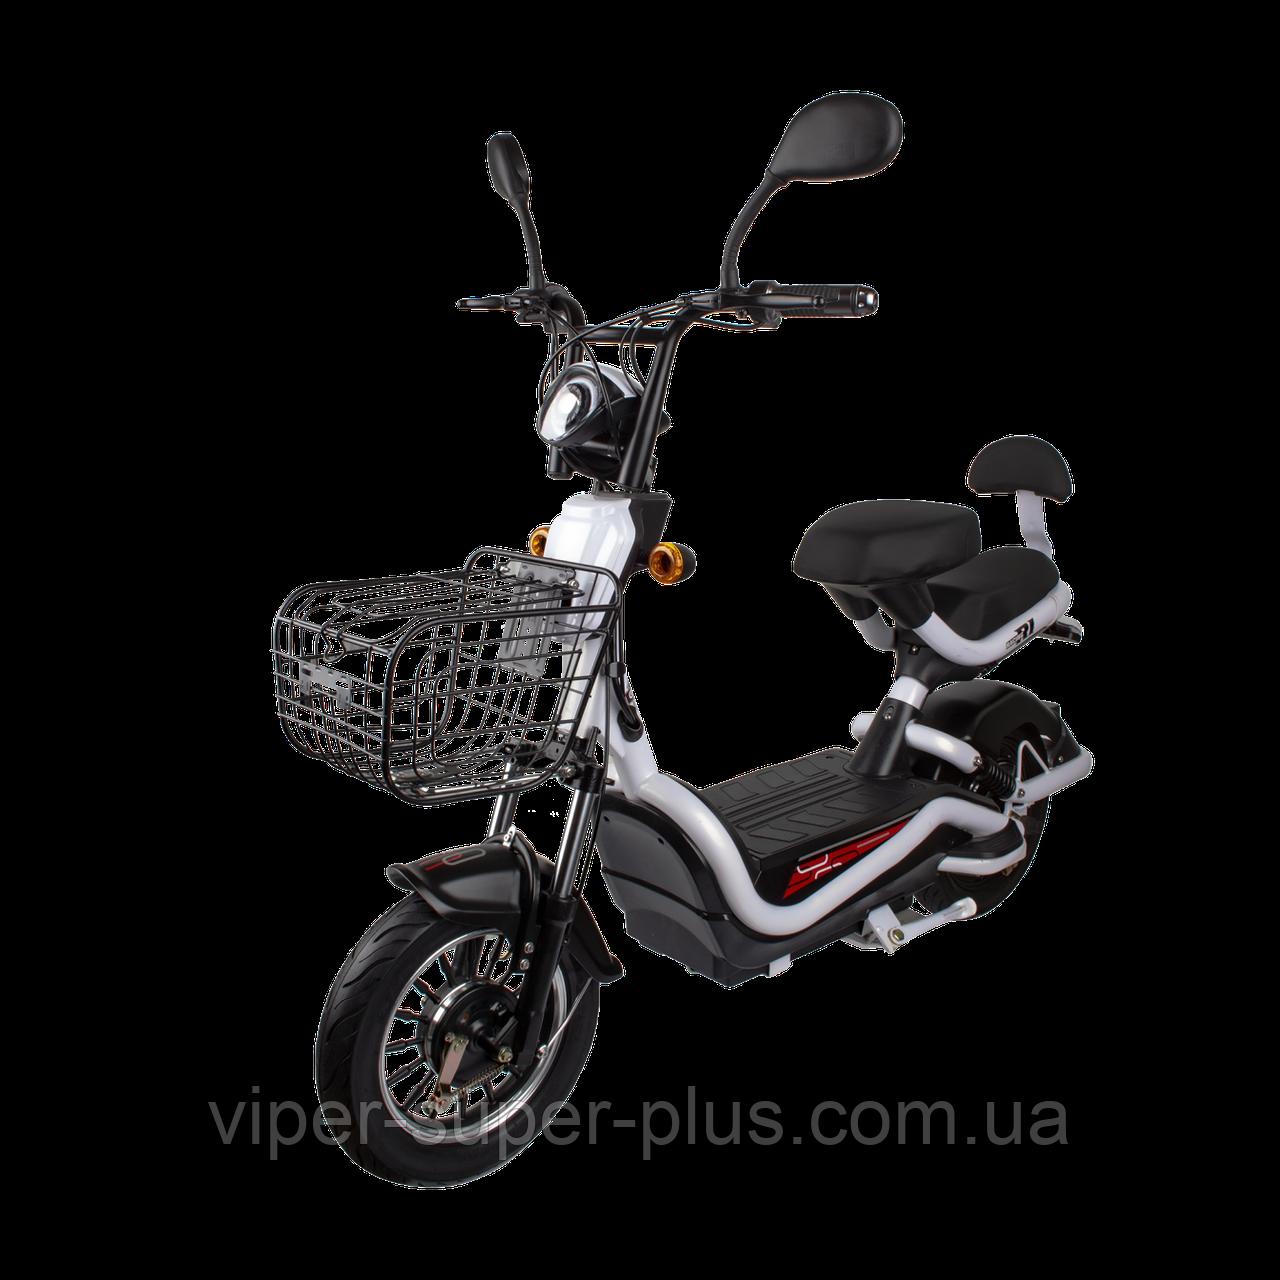 Электрический скутер  R1 RACING 500W/48V Белый